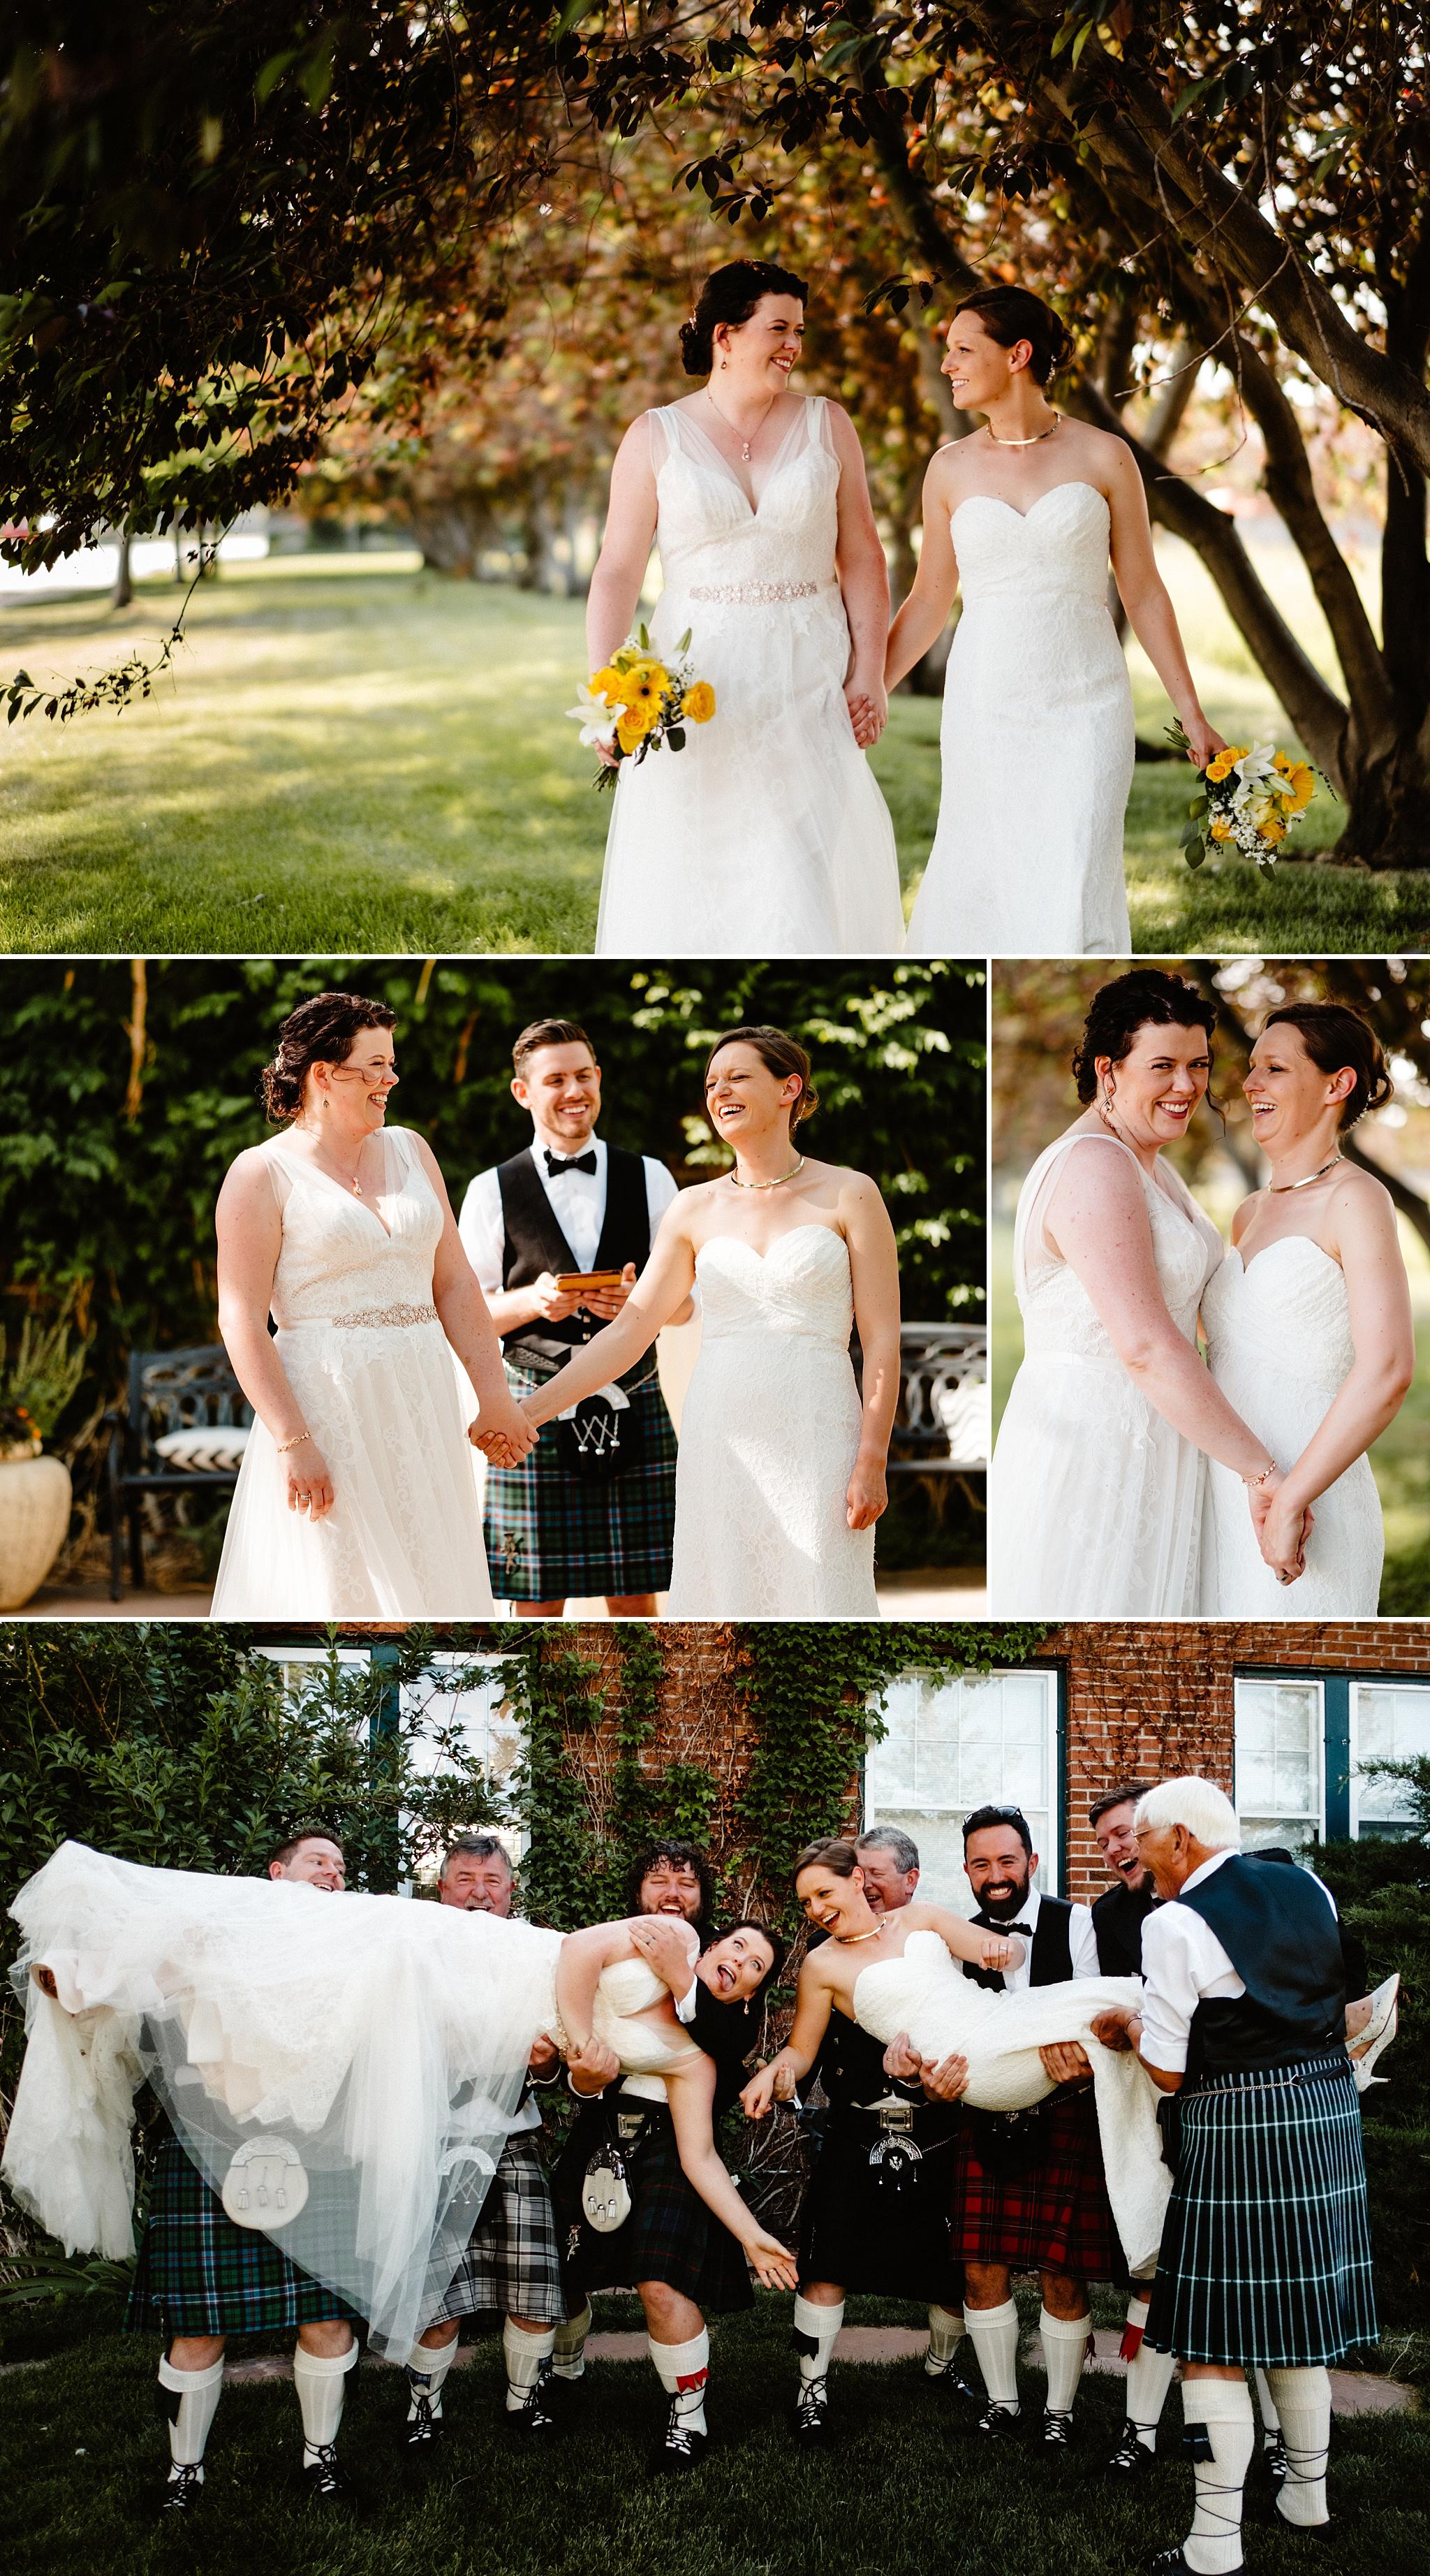 Denver-LGBTQ-Wedding-Photographer-3_WEB.jpg